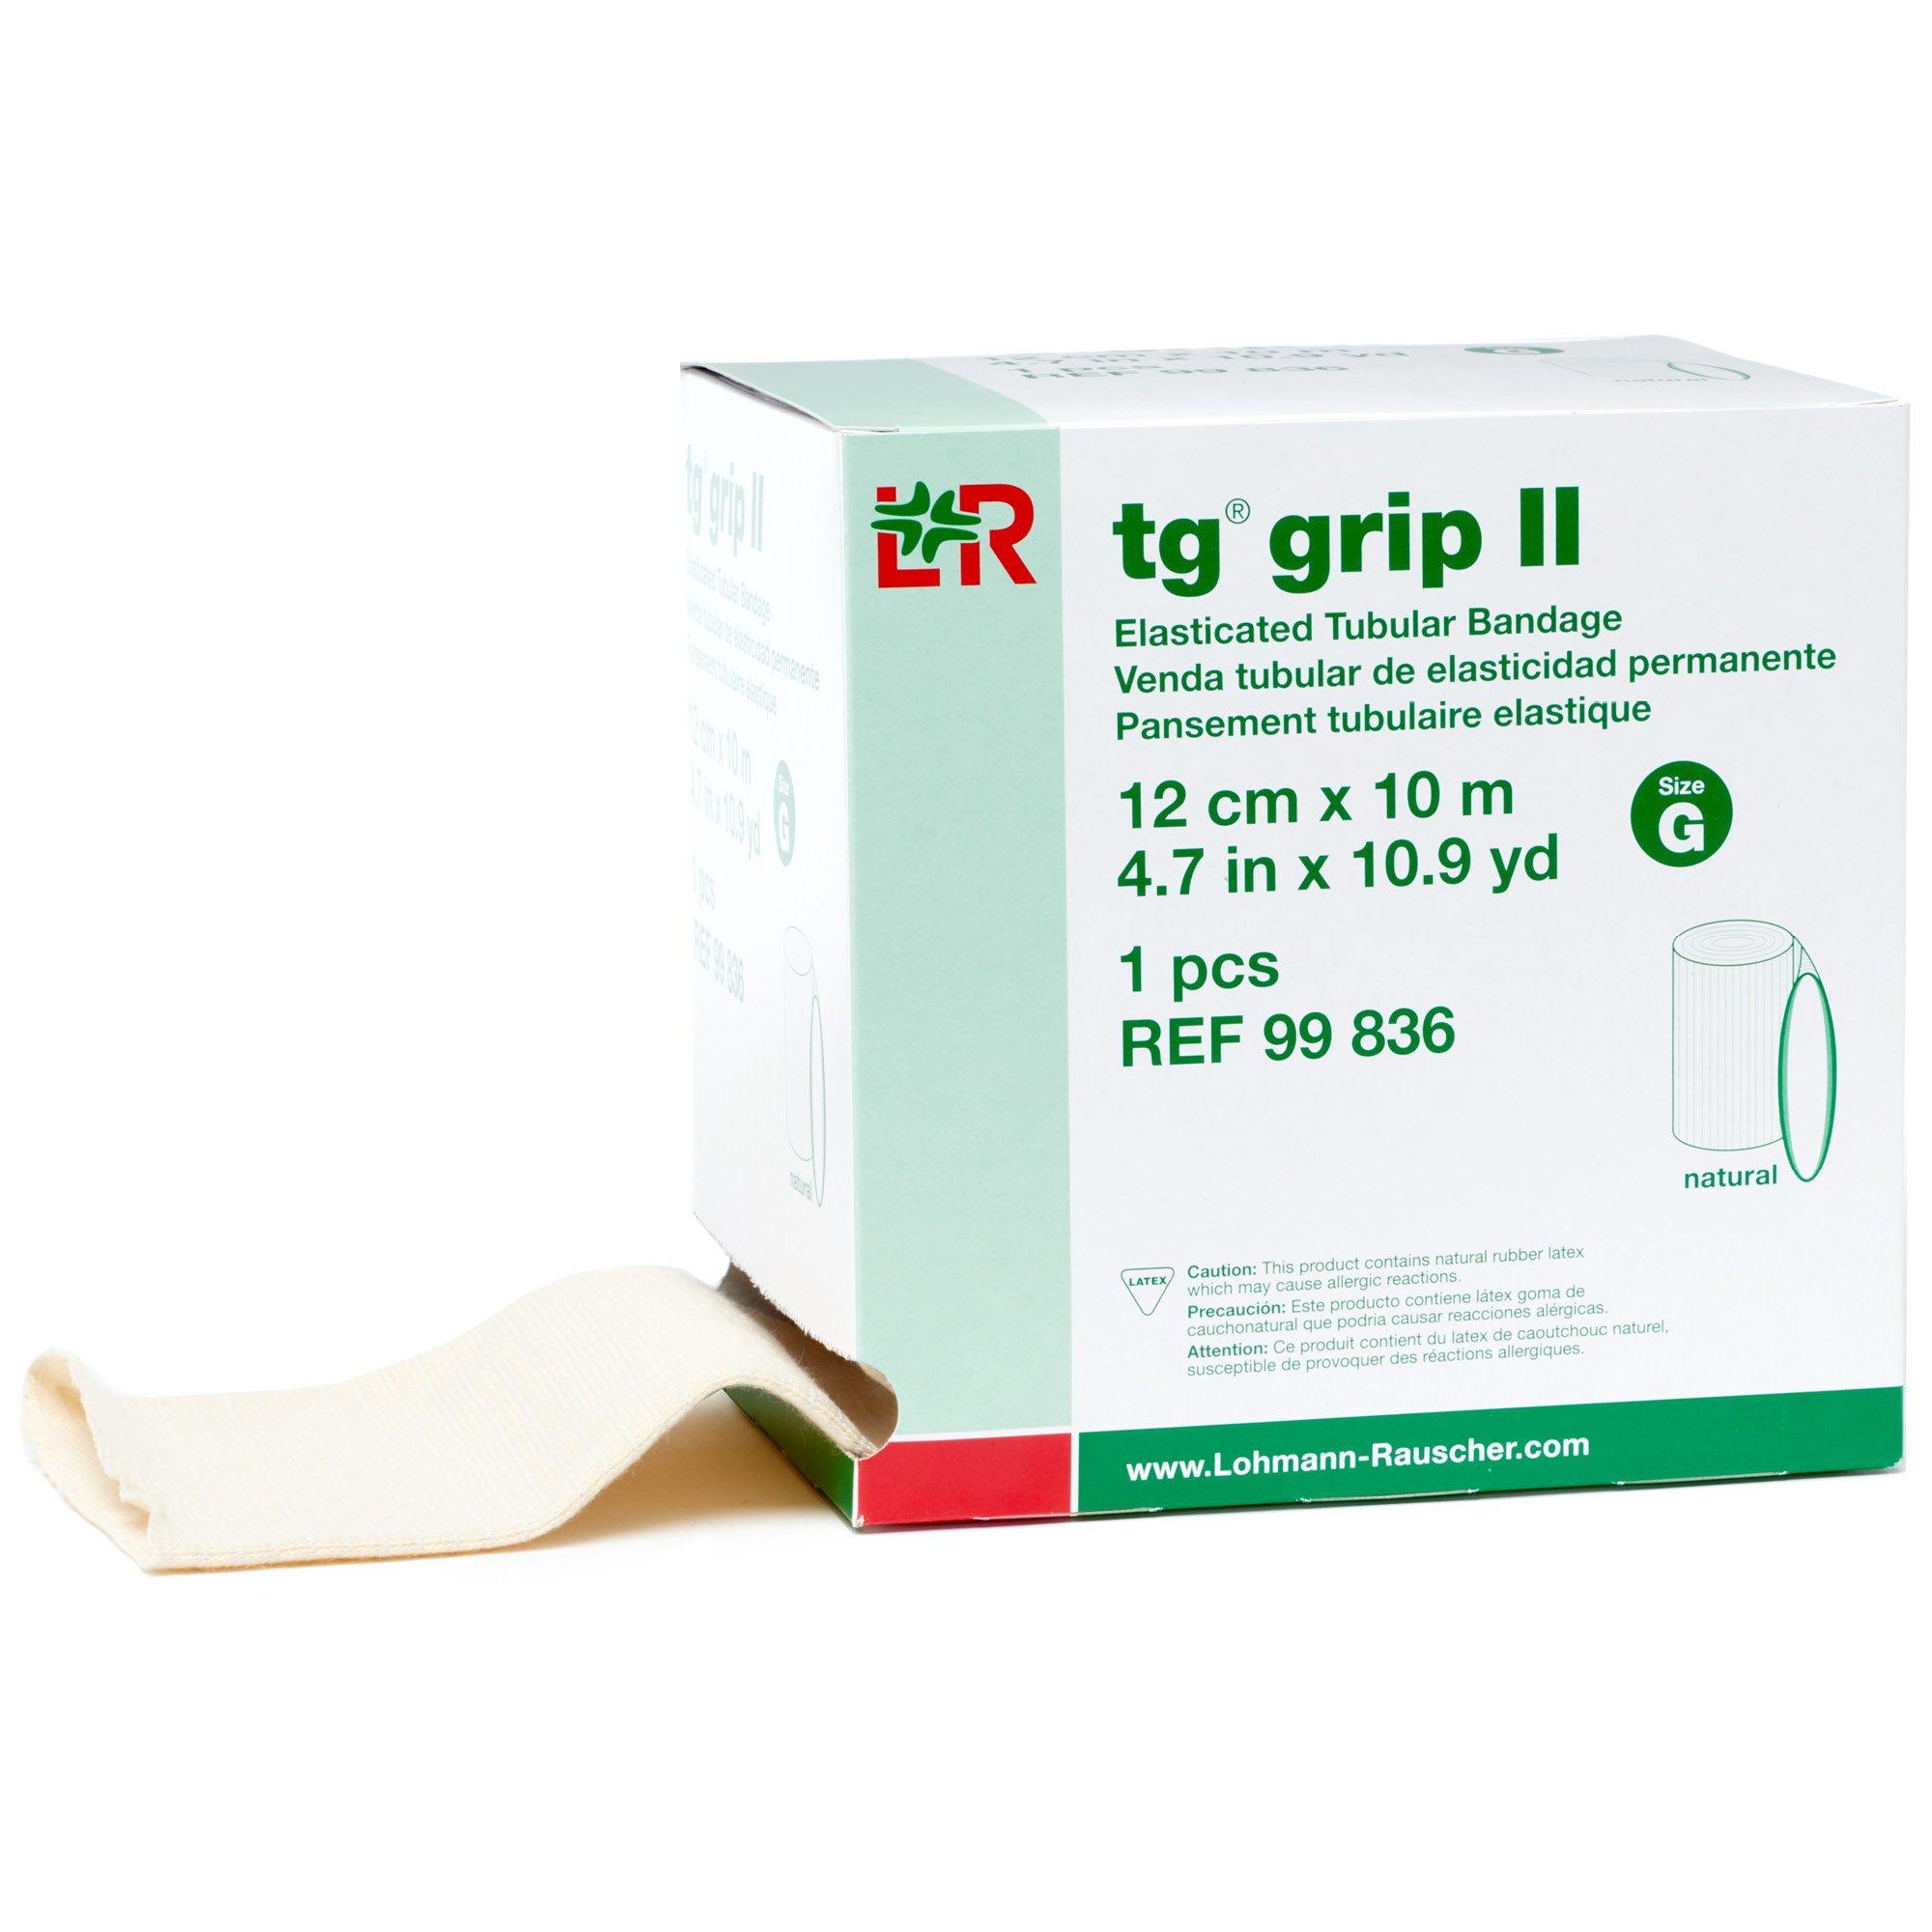 tg Grip II Elastic Tubular Compression Bandage, Seamless Tube Stockinette Wrap for Retention, Lymphedema, Swelling, Natural, Size G